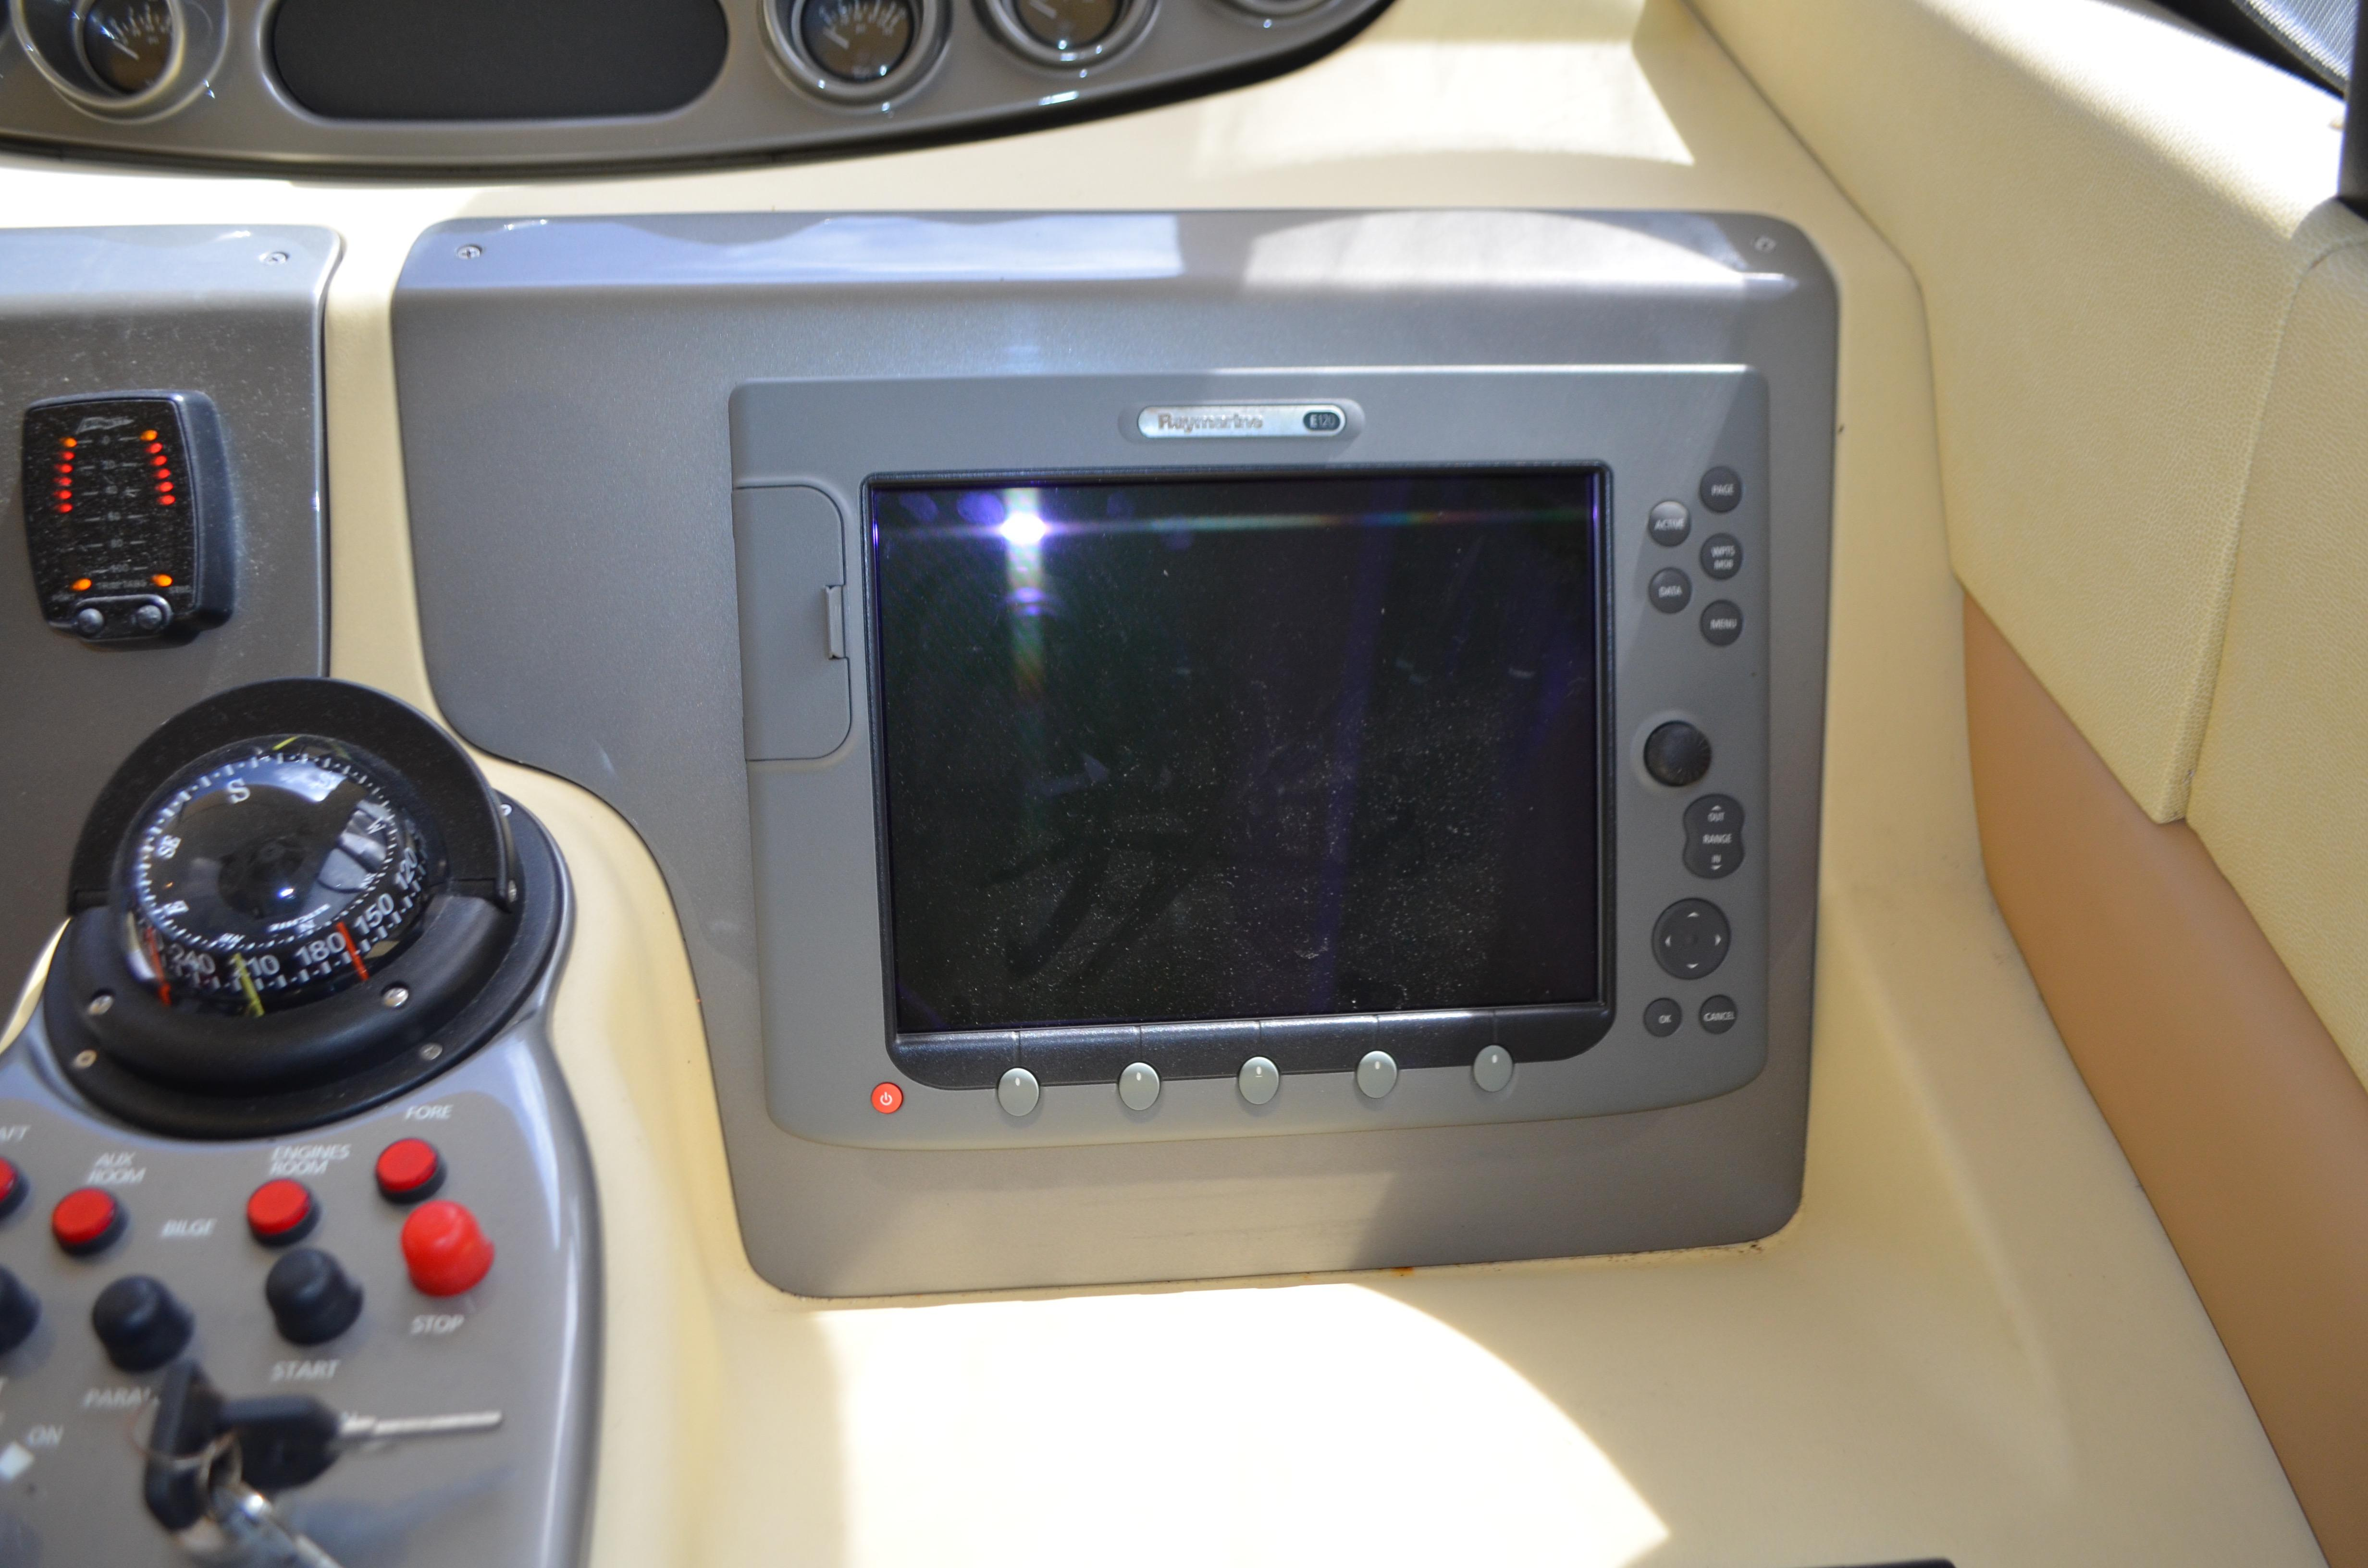 50 Azimut 2009 Miami Florida Sold On 2017 03 01 By Denison Yacht Sales Raymarine E120 Wiring Diagram